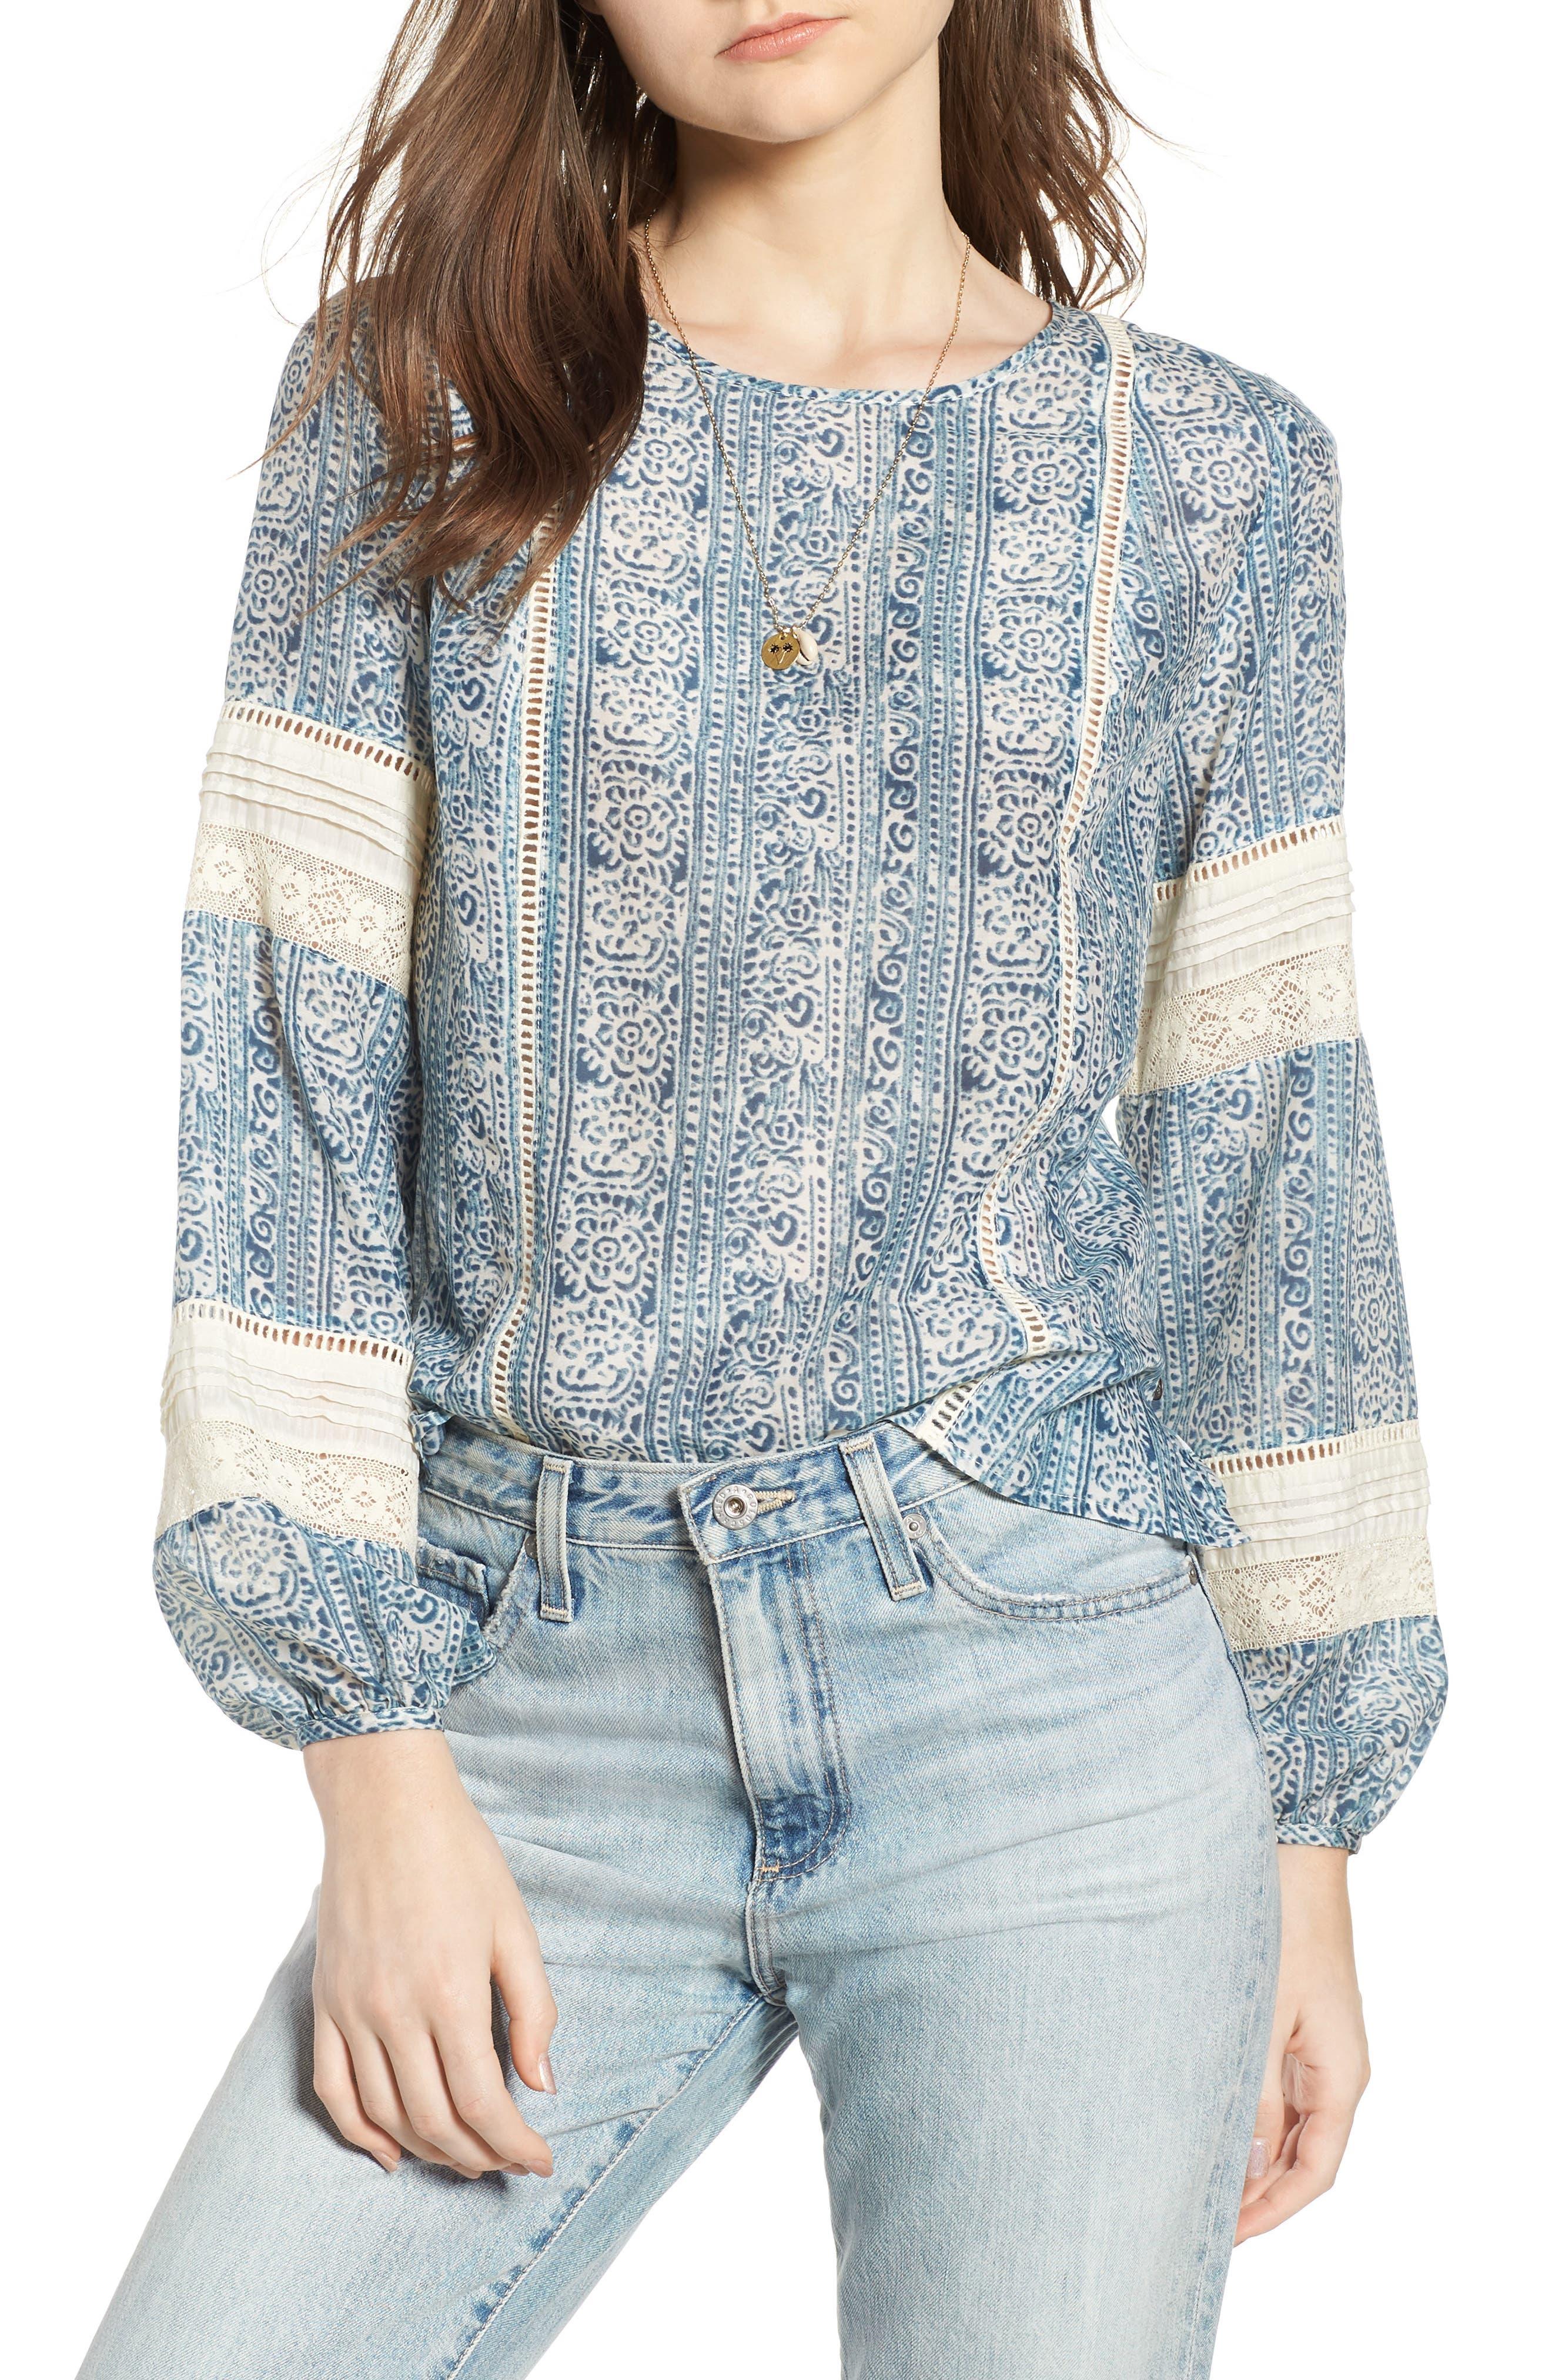 Pintuck Lace Blouse,                         Main,                         color, Color 17 Combo A